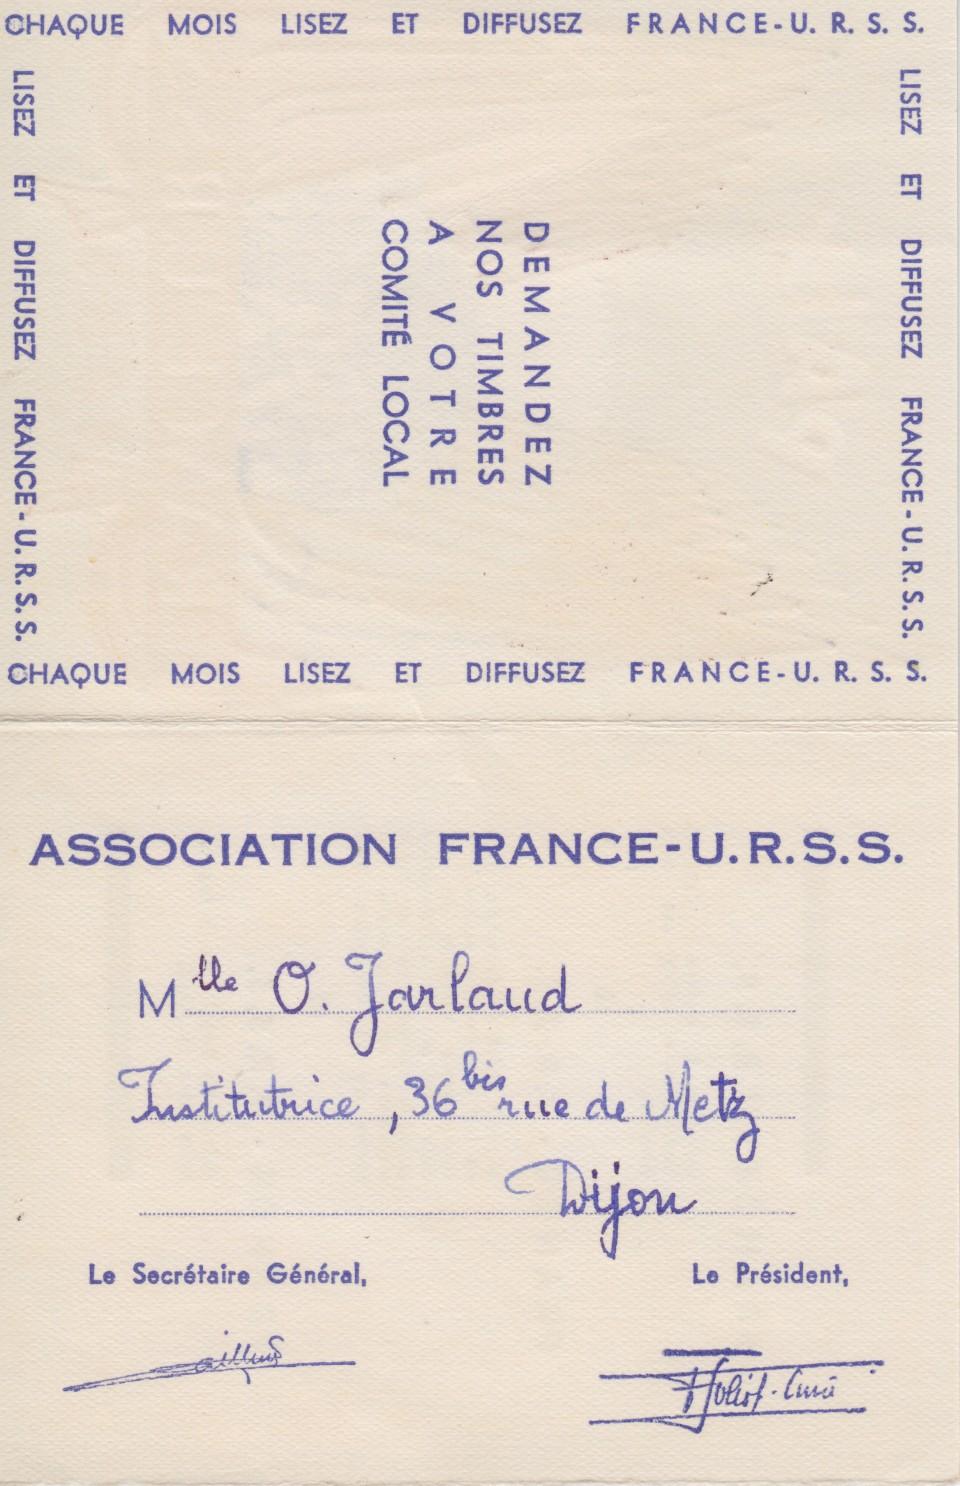 jarlaud-france-urss-1951bis